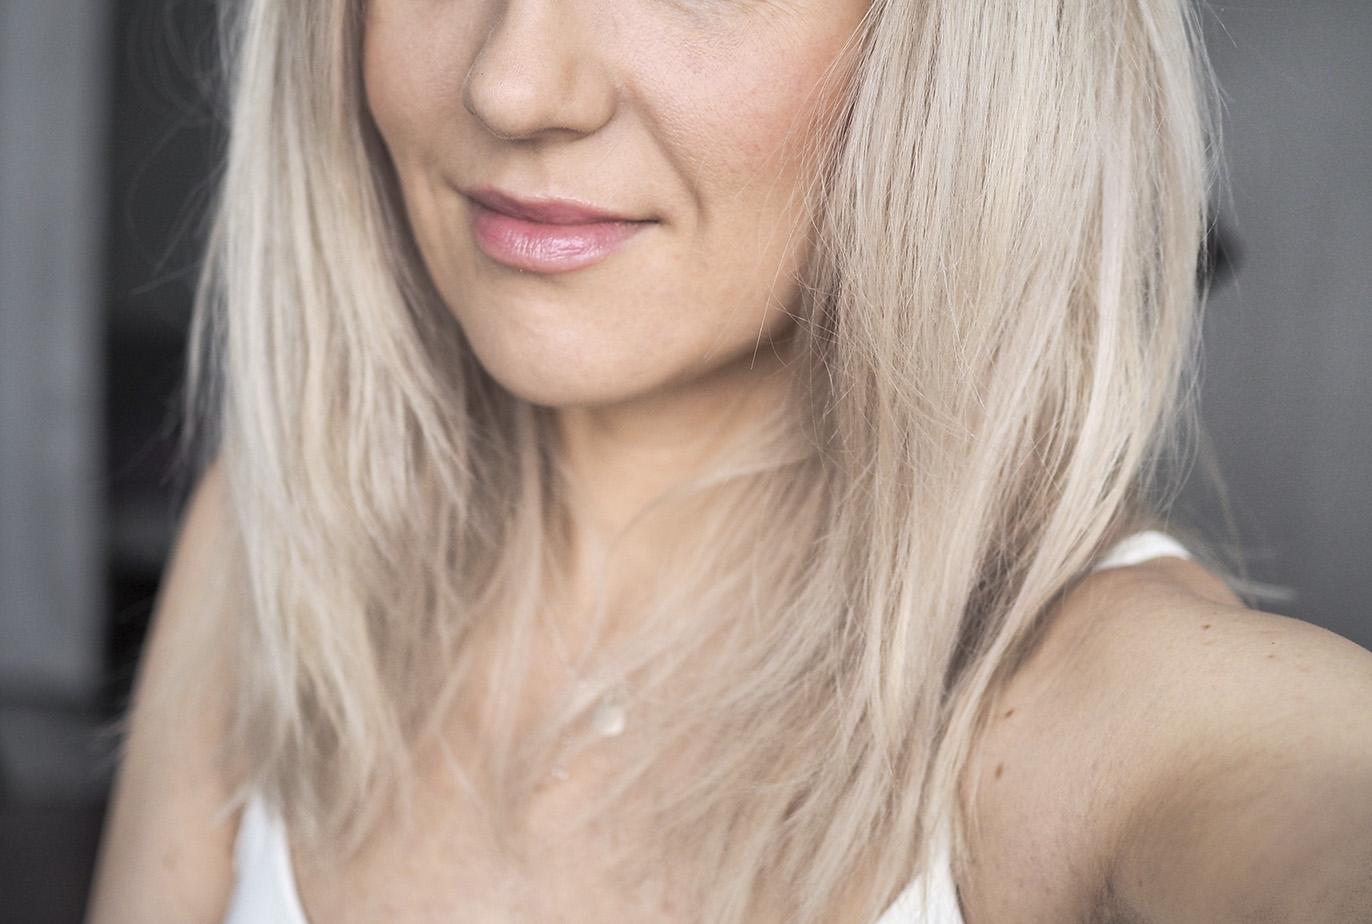 blondisävy hiukset4pieni.jpg